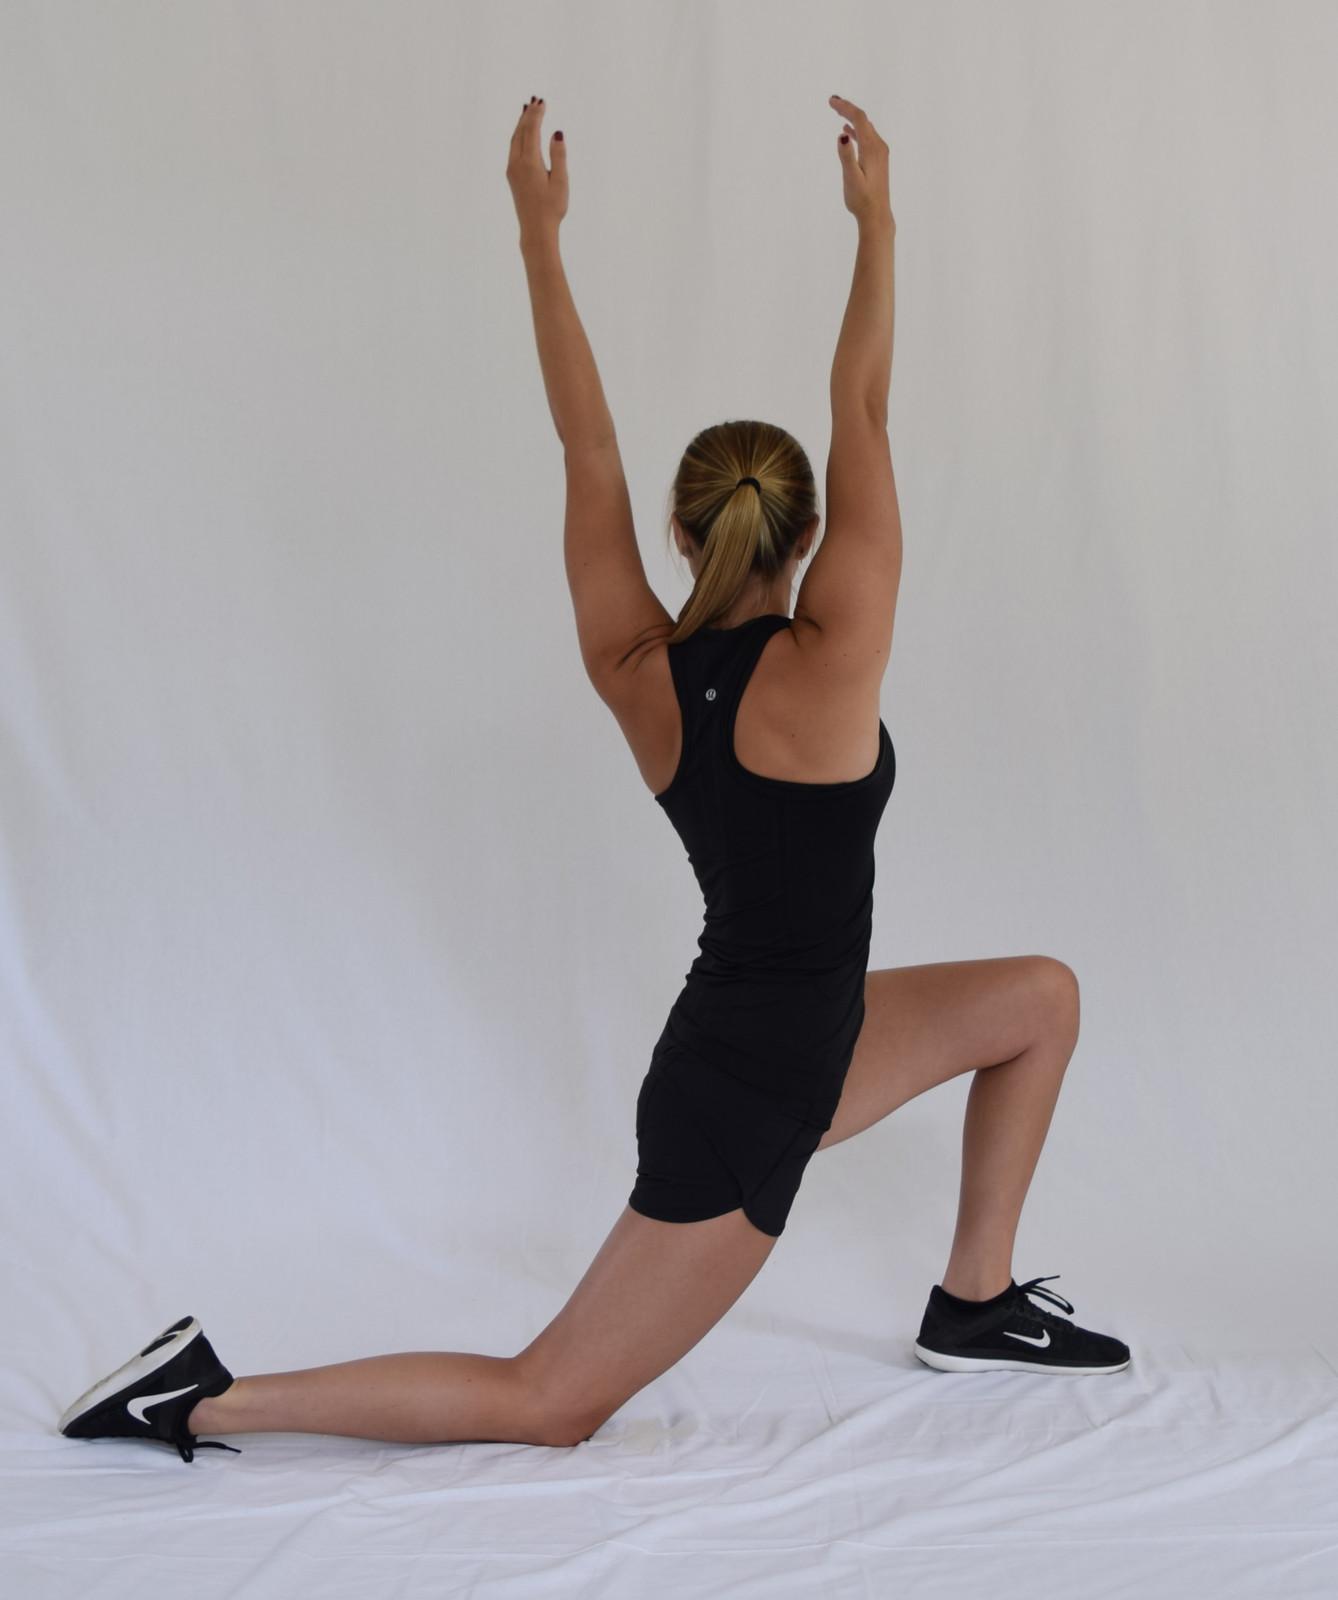 Kneeling Psoas Stretch With Rotation.jpg